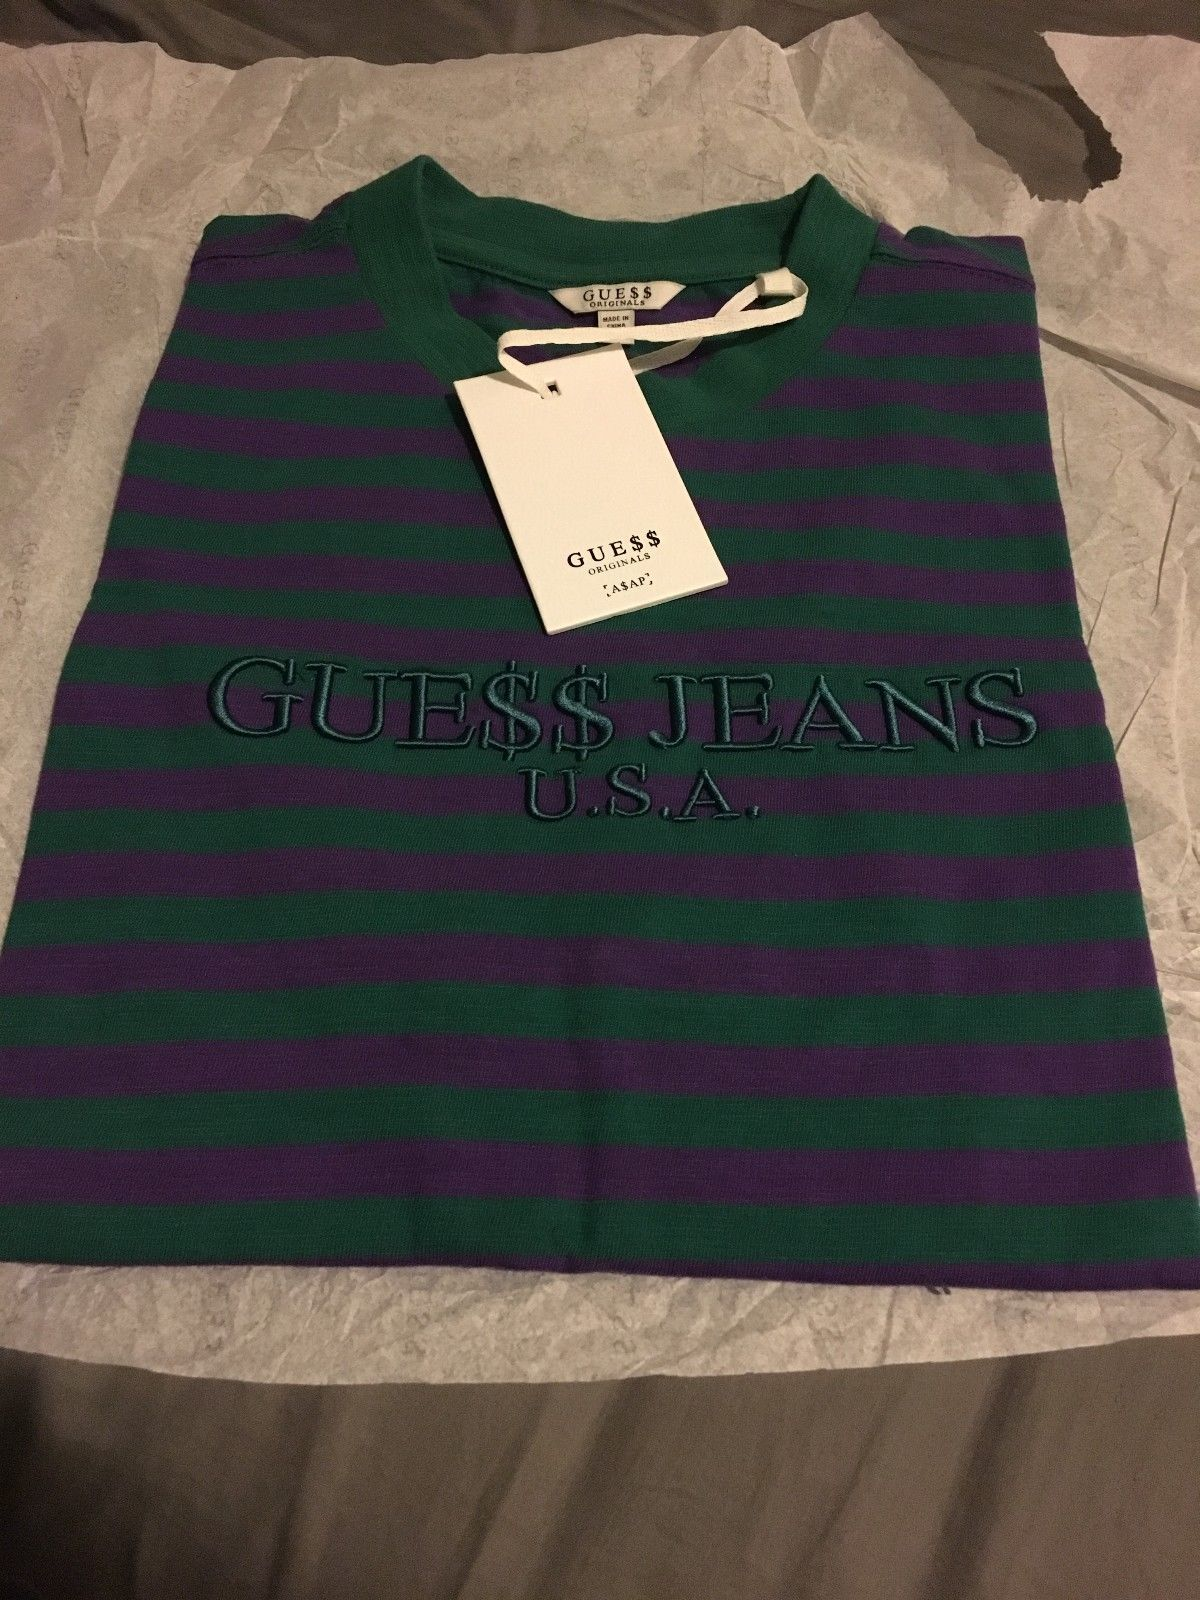 622661c8b841 Guess x Asap Rocky Striped Shirt Green Purple Medium GUE$$ Jeans USA #rare